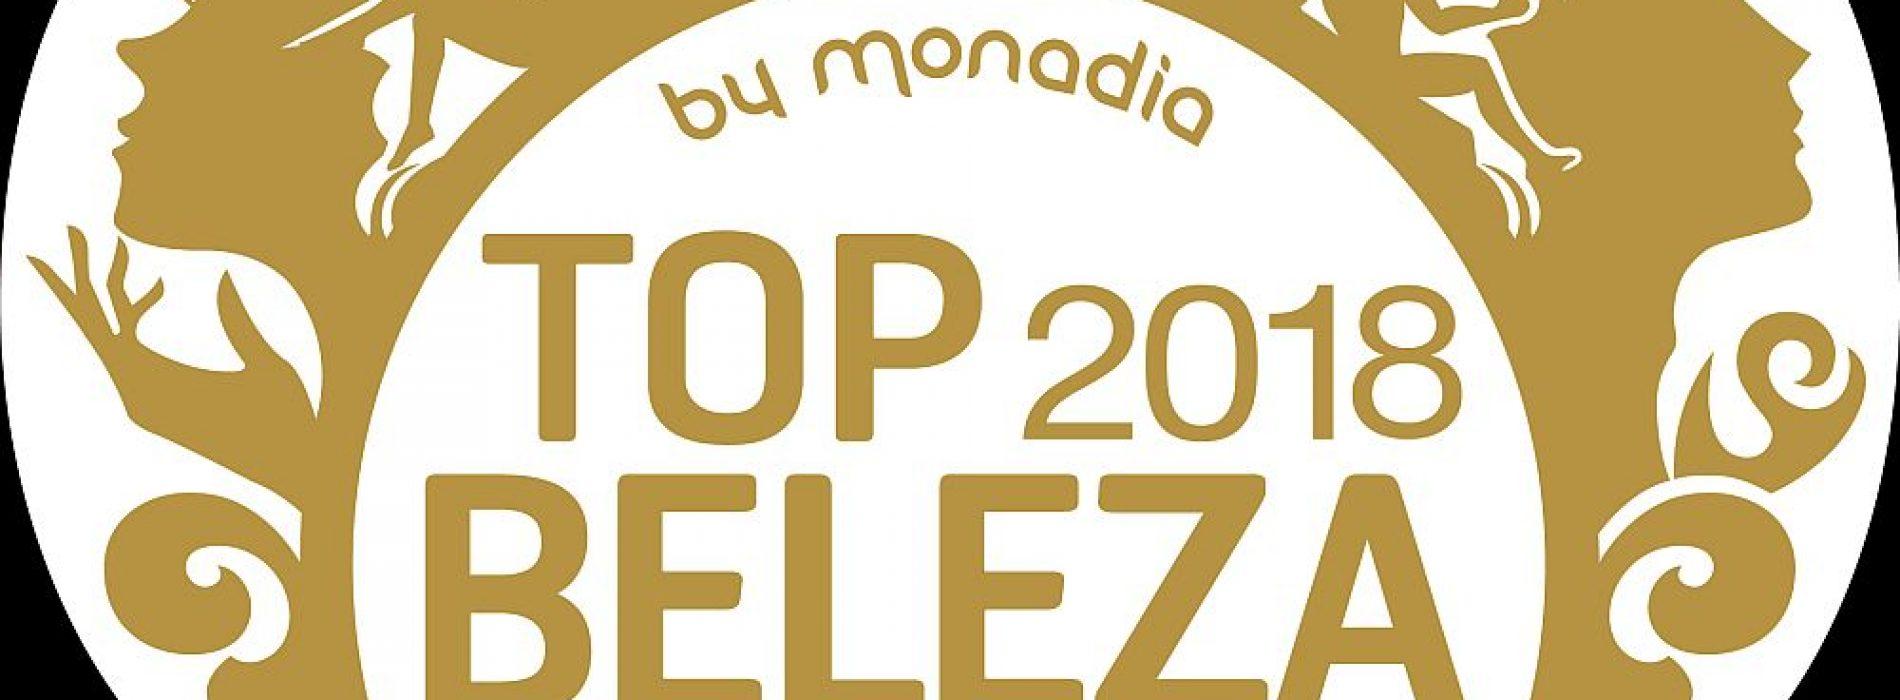 Lidl e Intermarché lideram prêmios Top Beleza